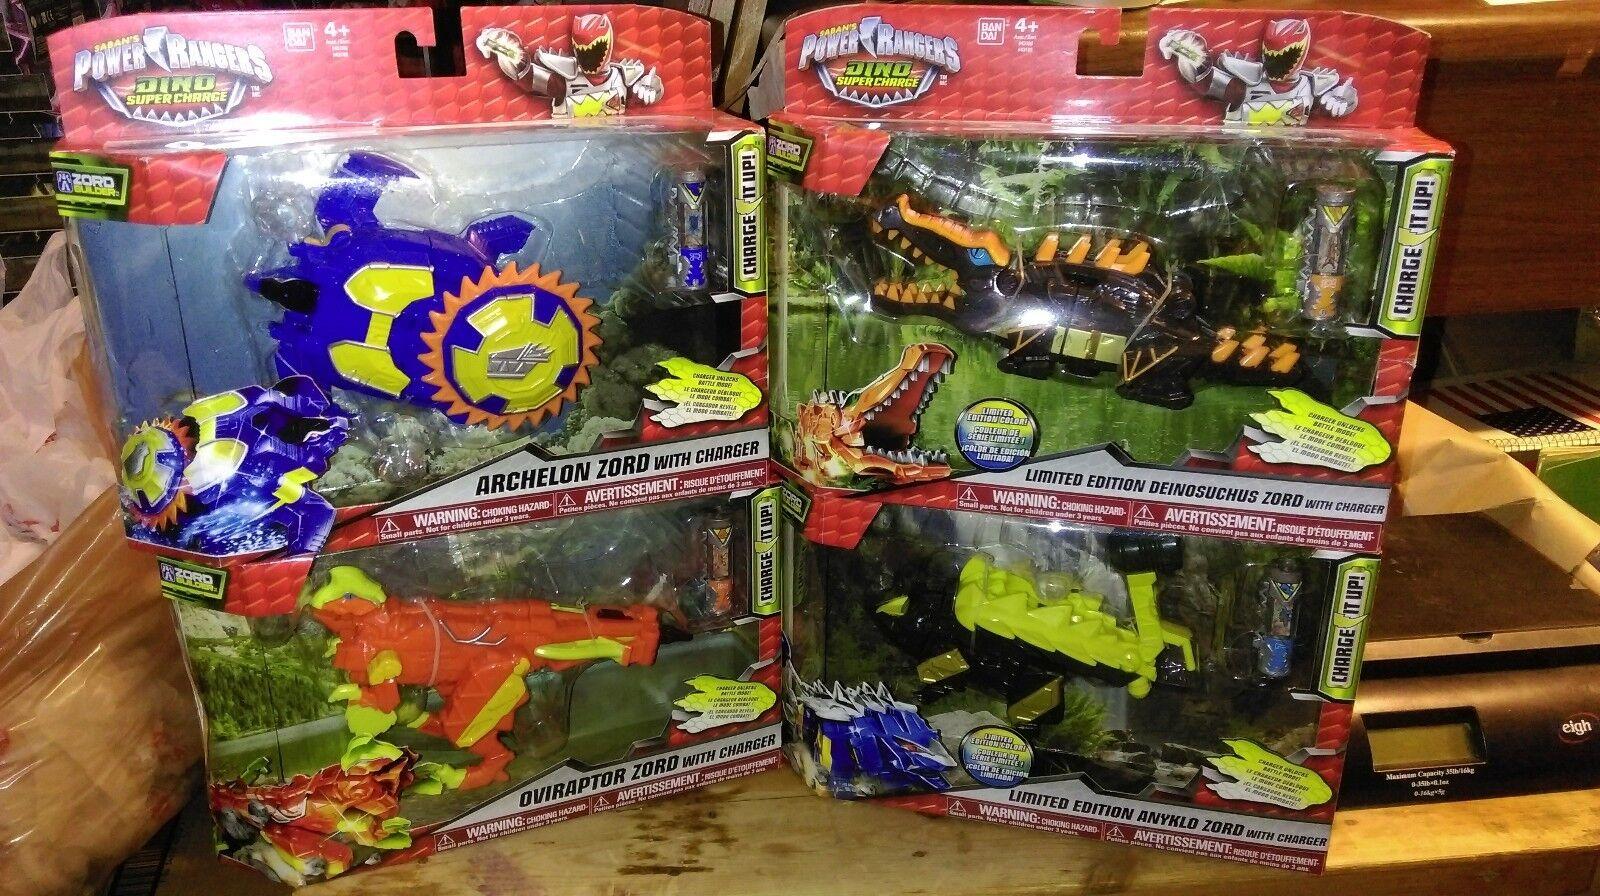 Power Rangers Dino cargo limitada Zord Deinosuchus archelon anyklo oviraptor Nuevo